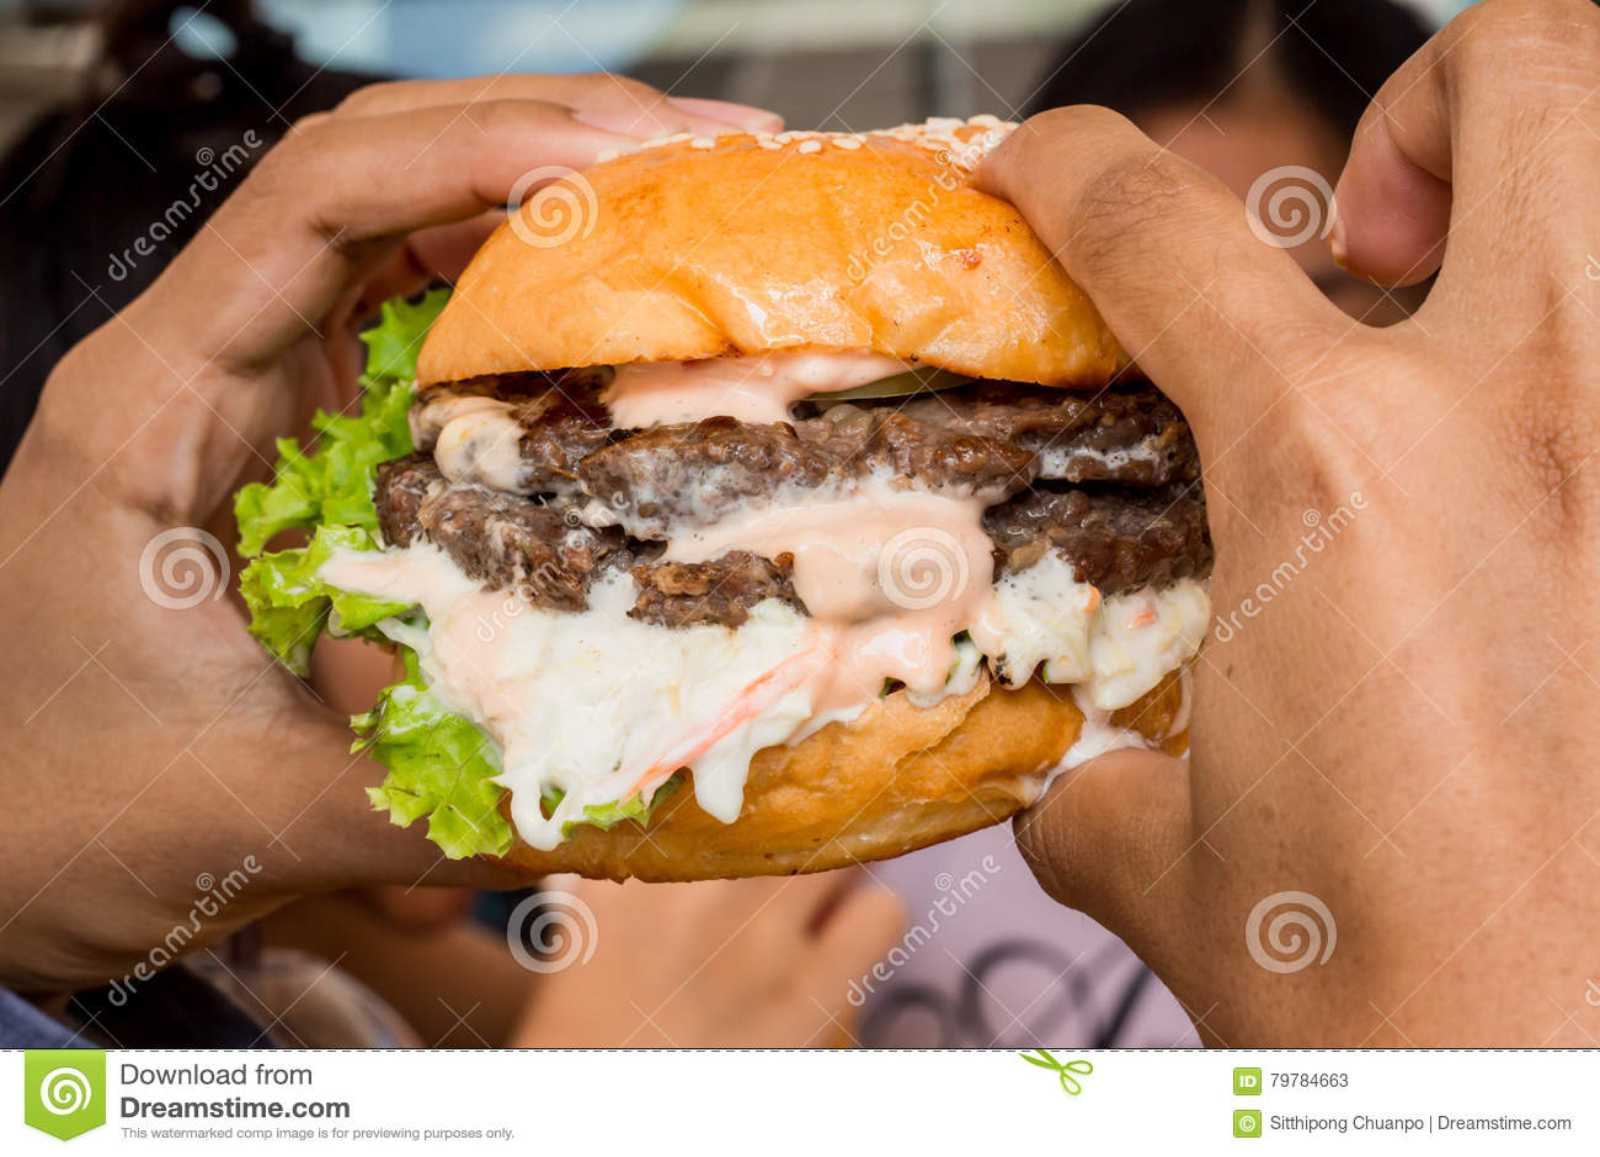 Hamburger nella mano